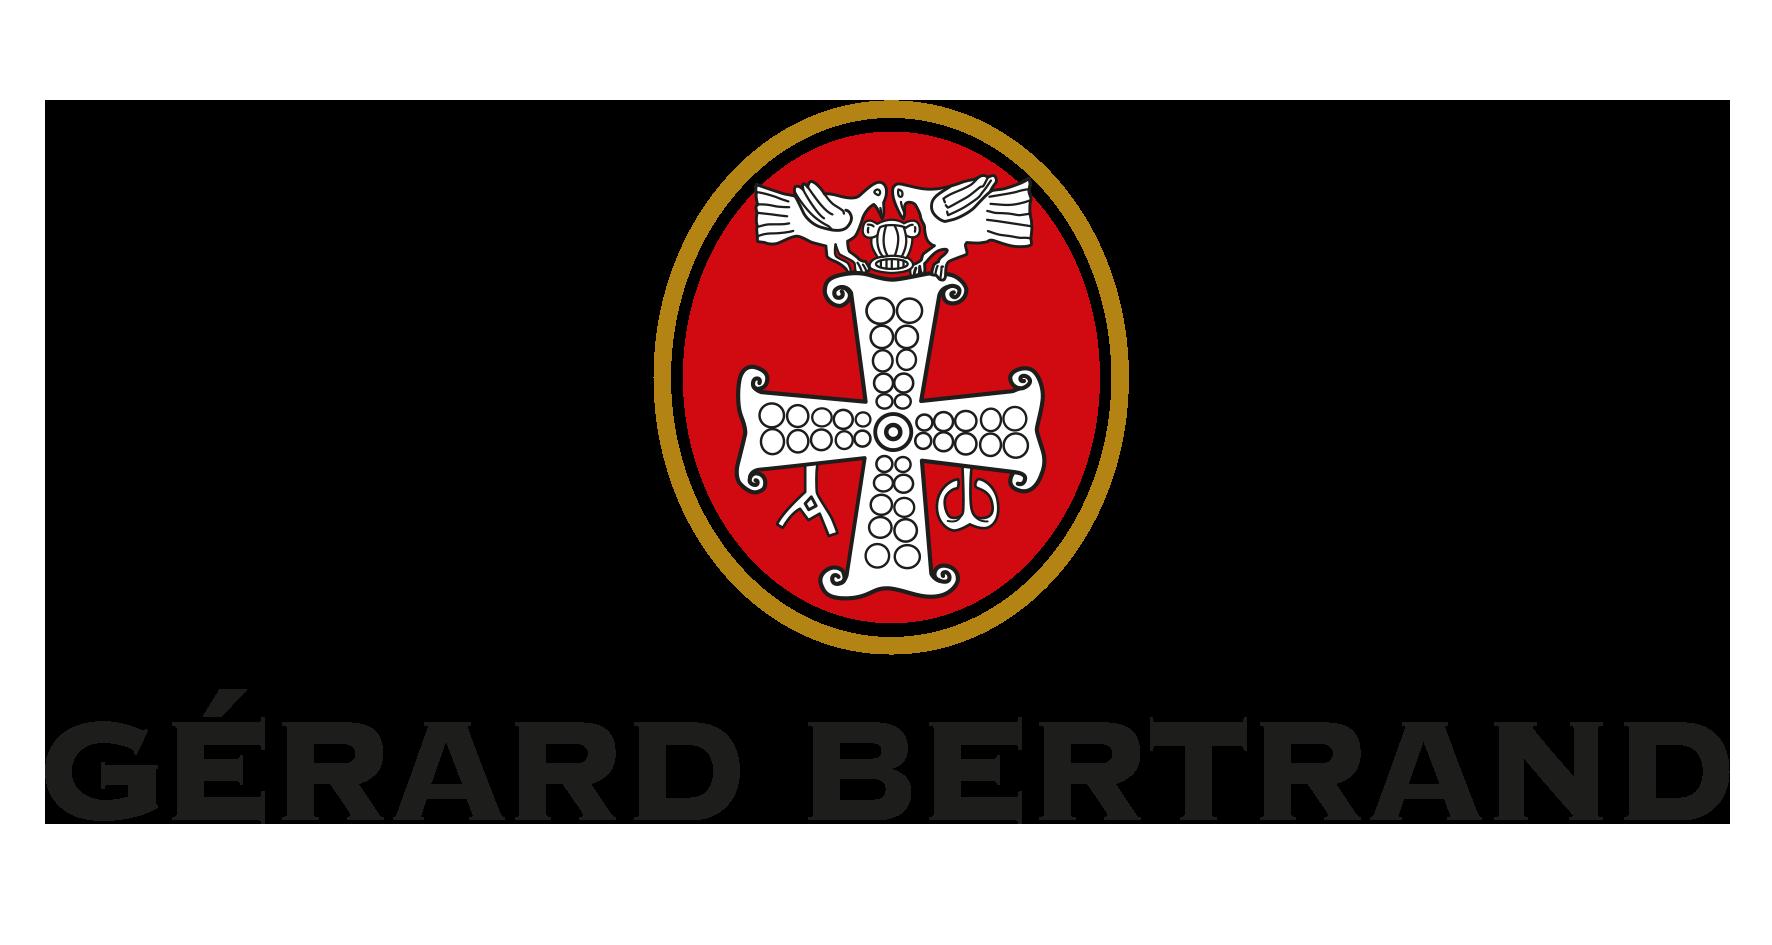 Gerard Bertrand (DS)